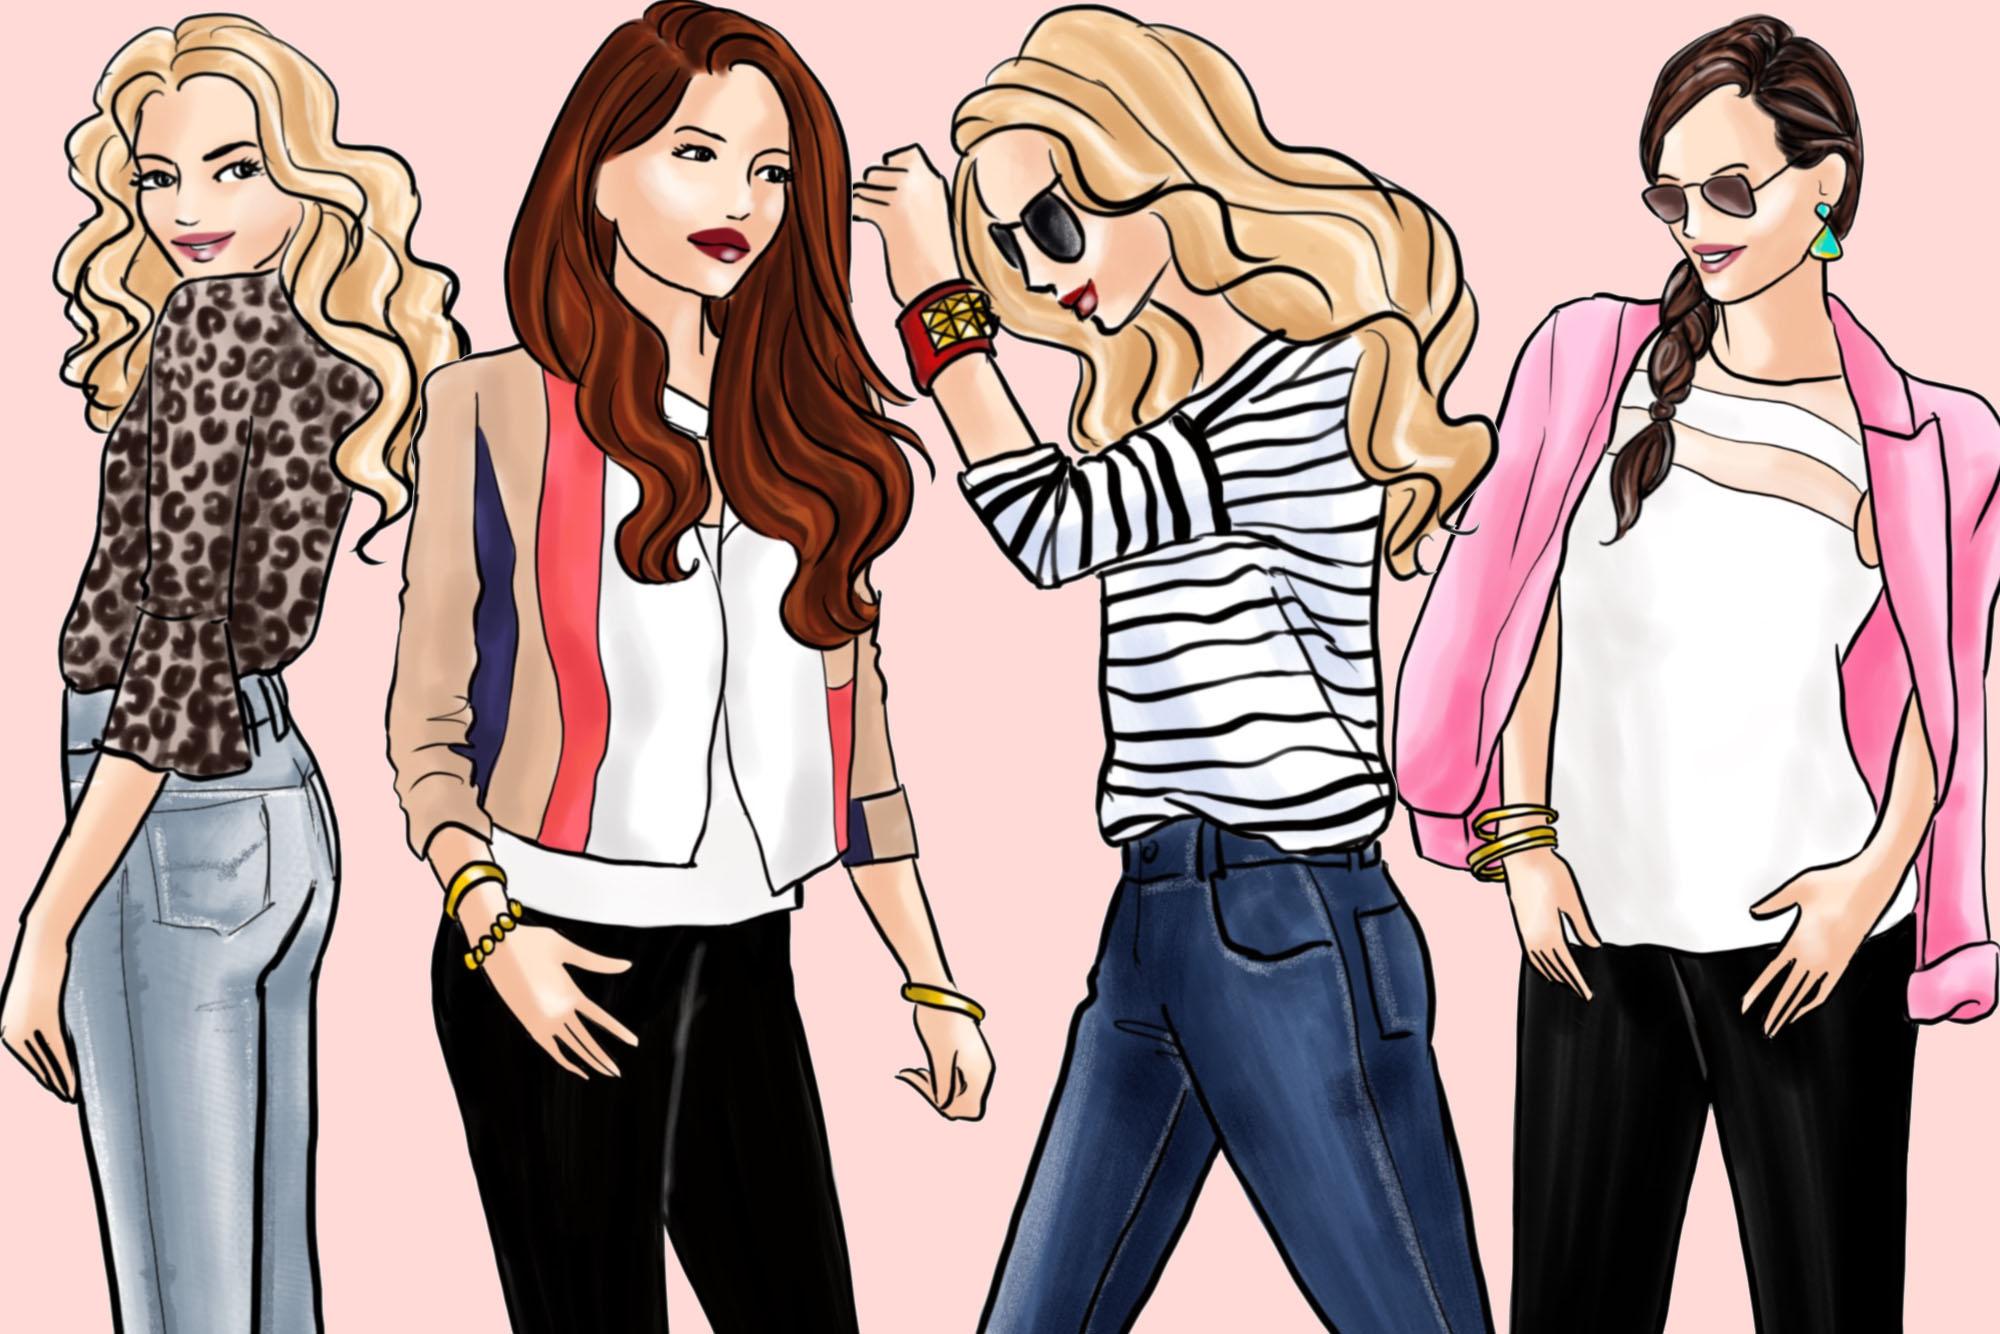 Fashion illustration clipart - Fashion Girls 31 - Light Skin example image 3